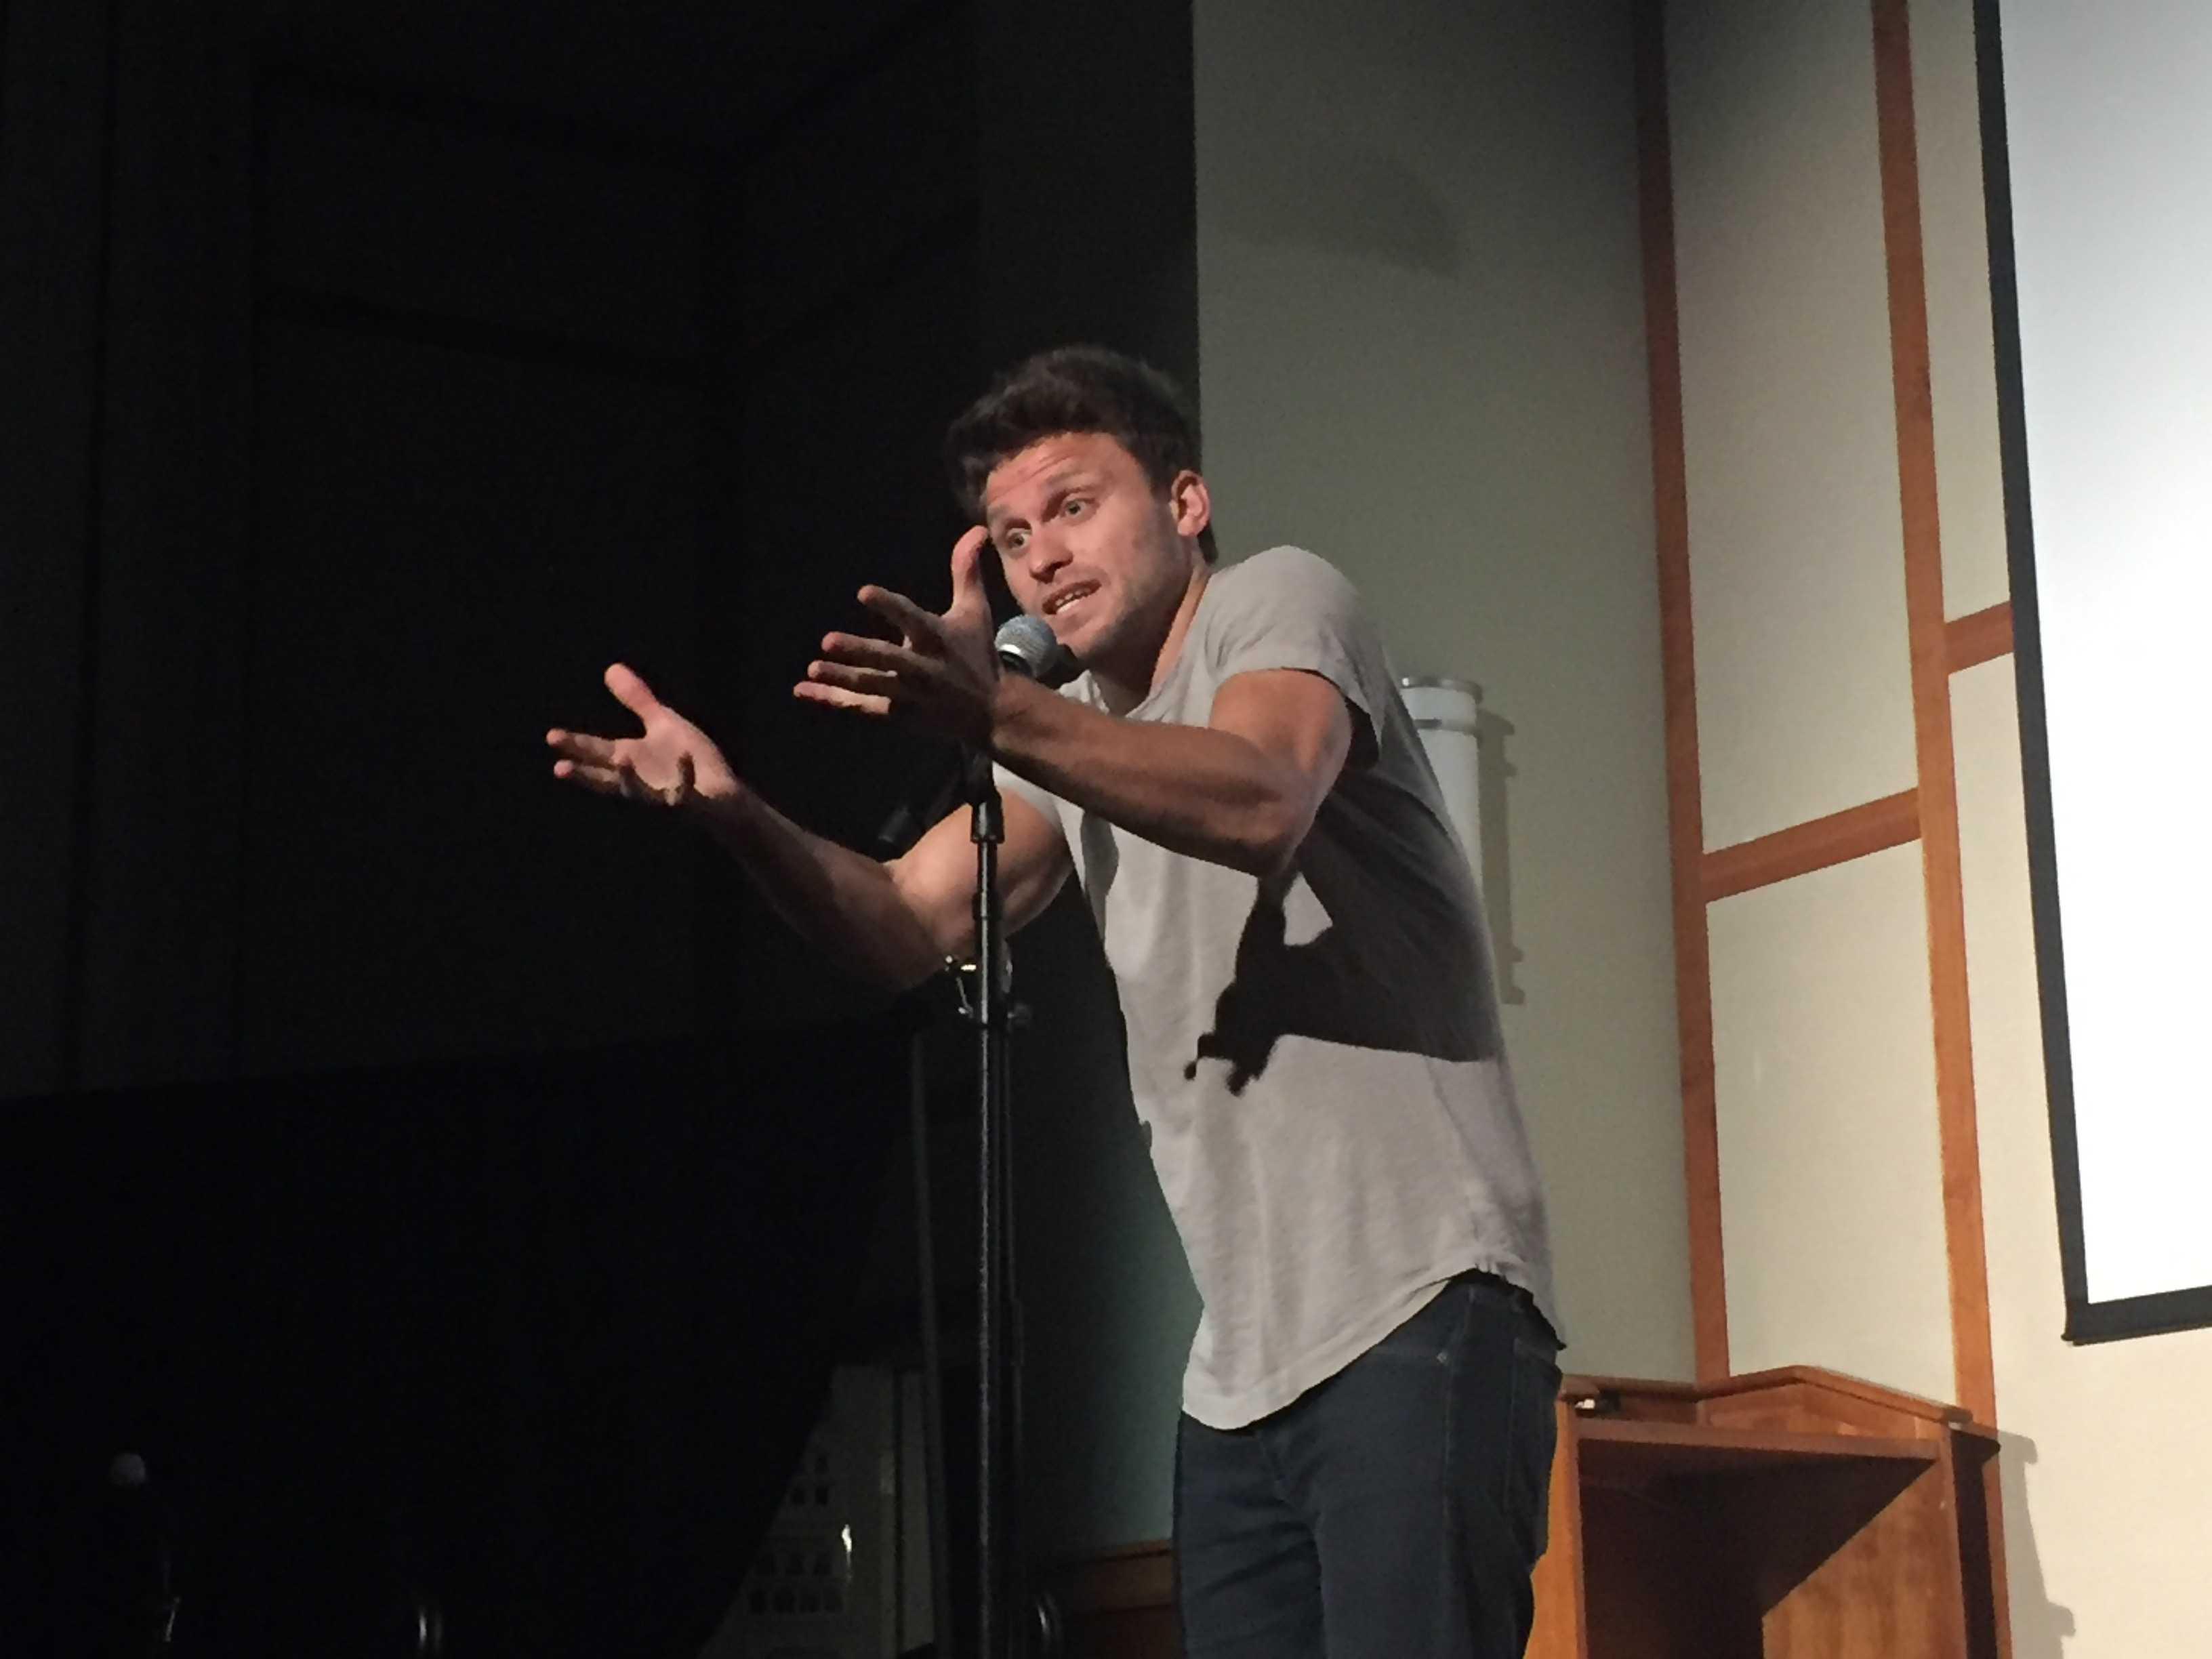 Jon Rudnitsky jokes with the audience. / Photo by Ashley Wong